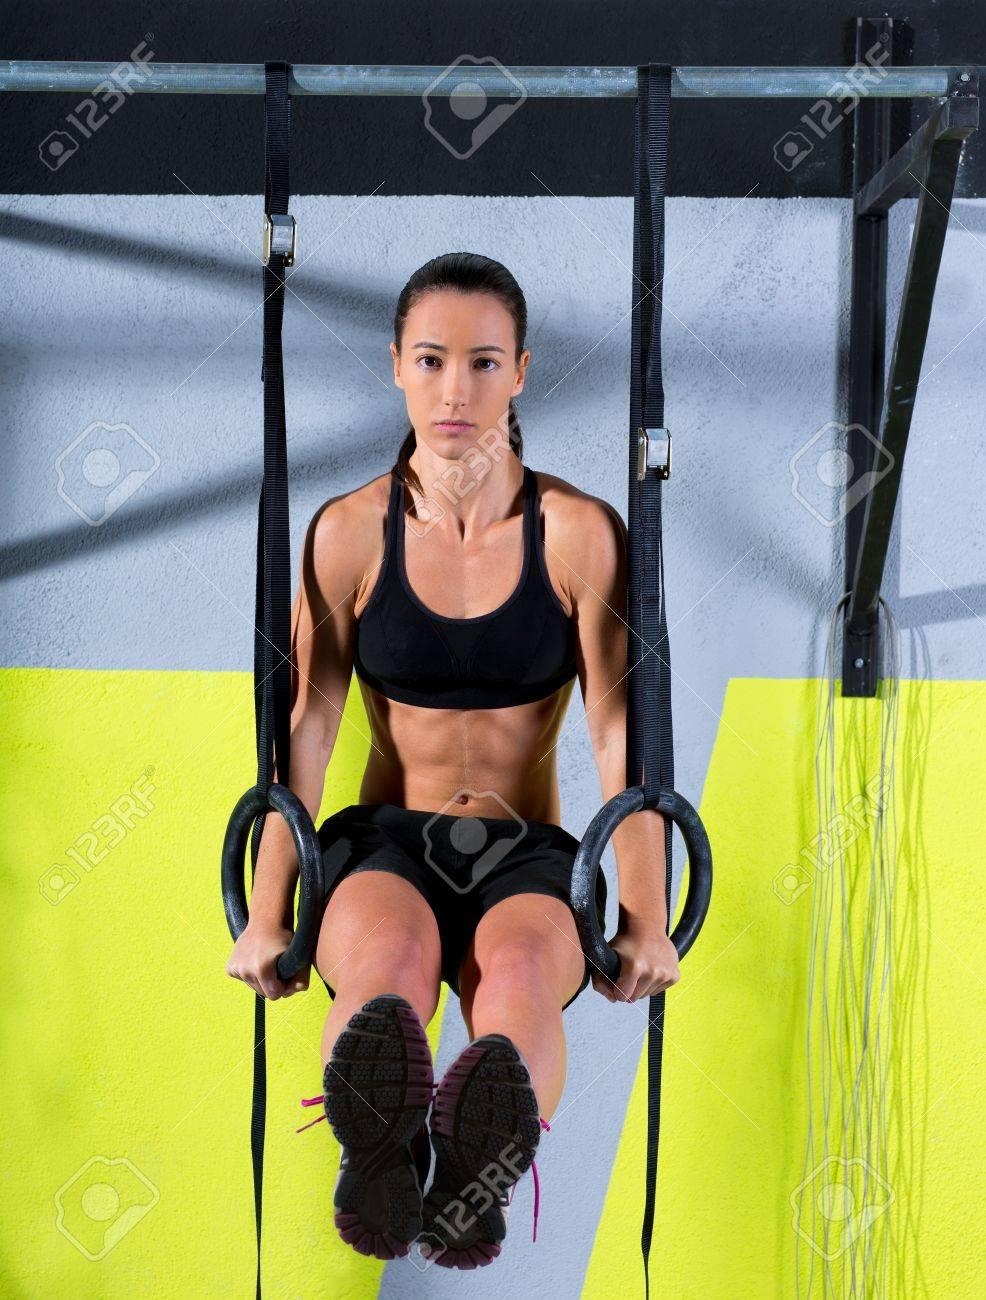 Crossfit dip ring woman workout at gym dipping exercise Standard-Bild - 17050554